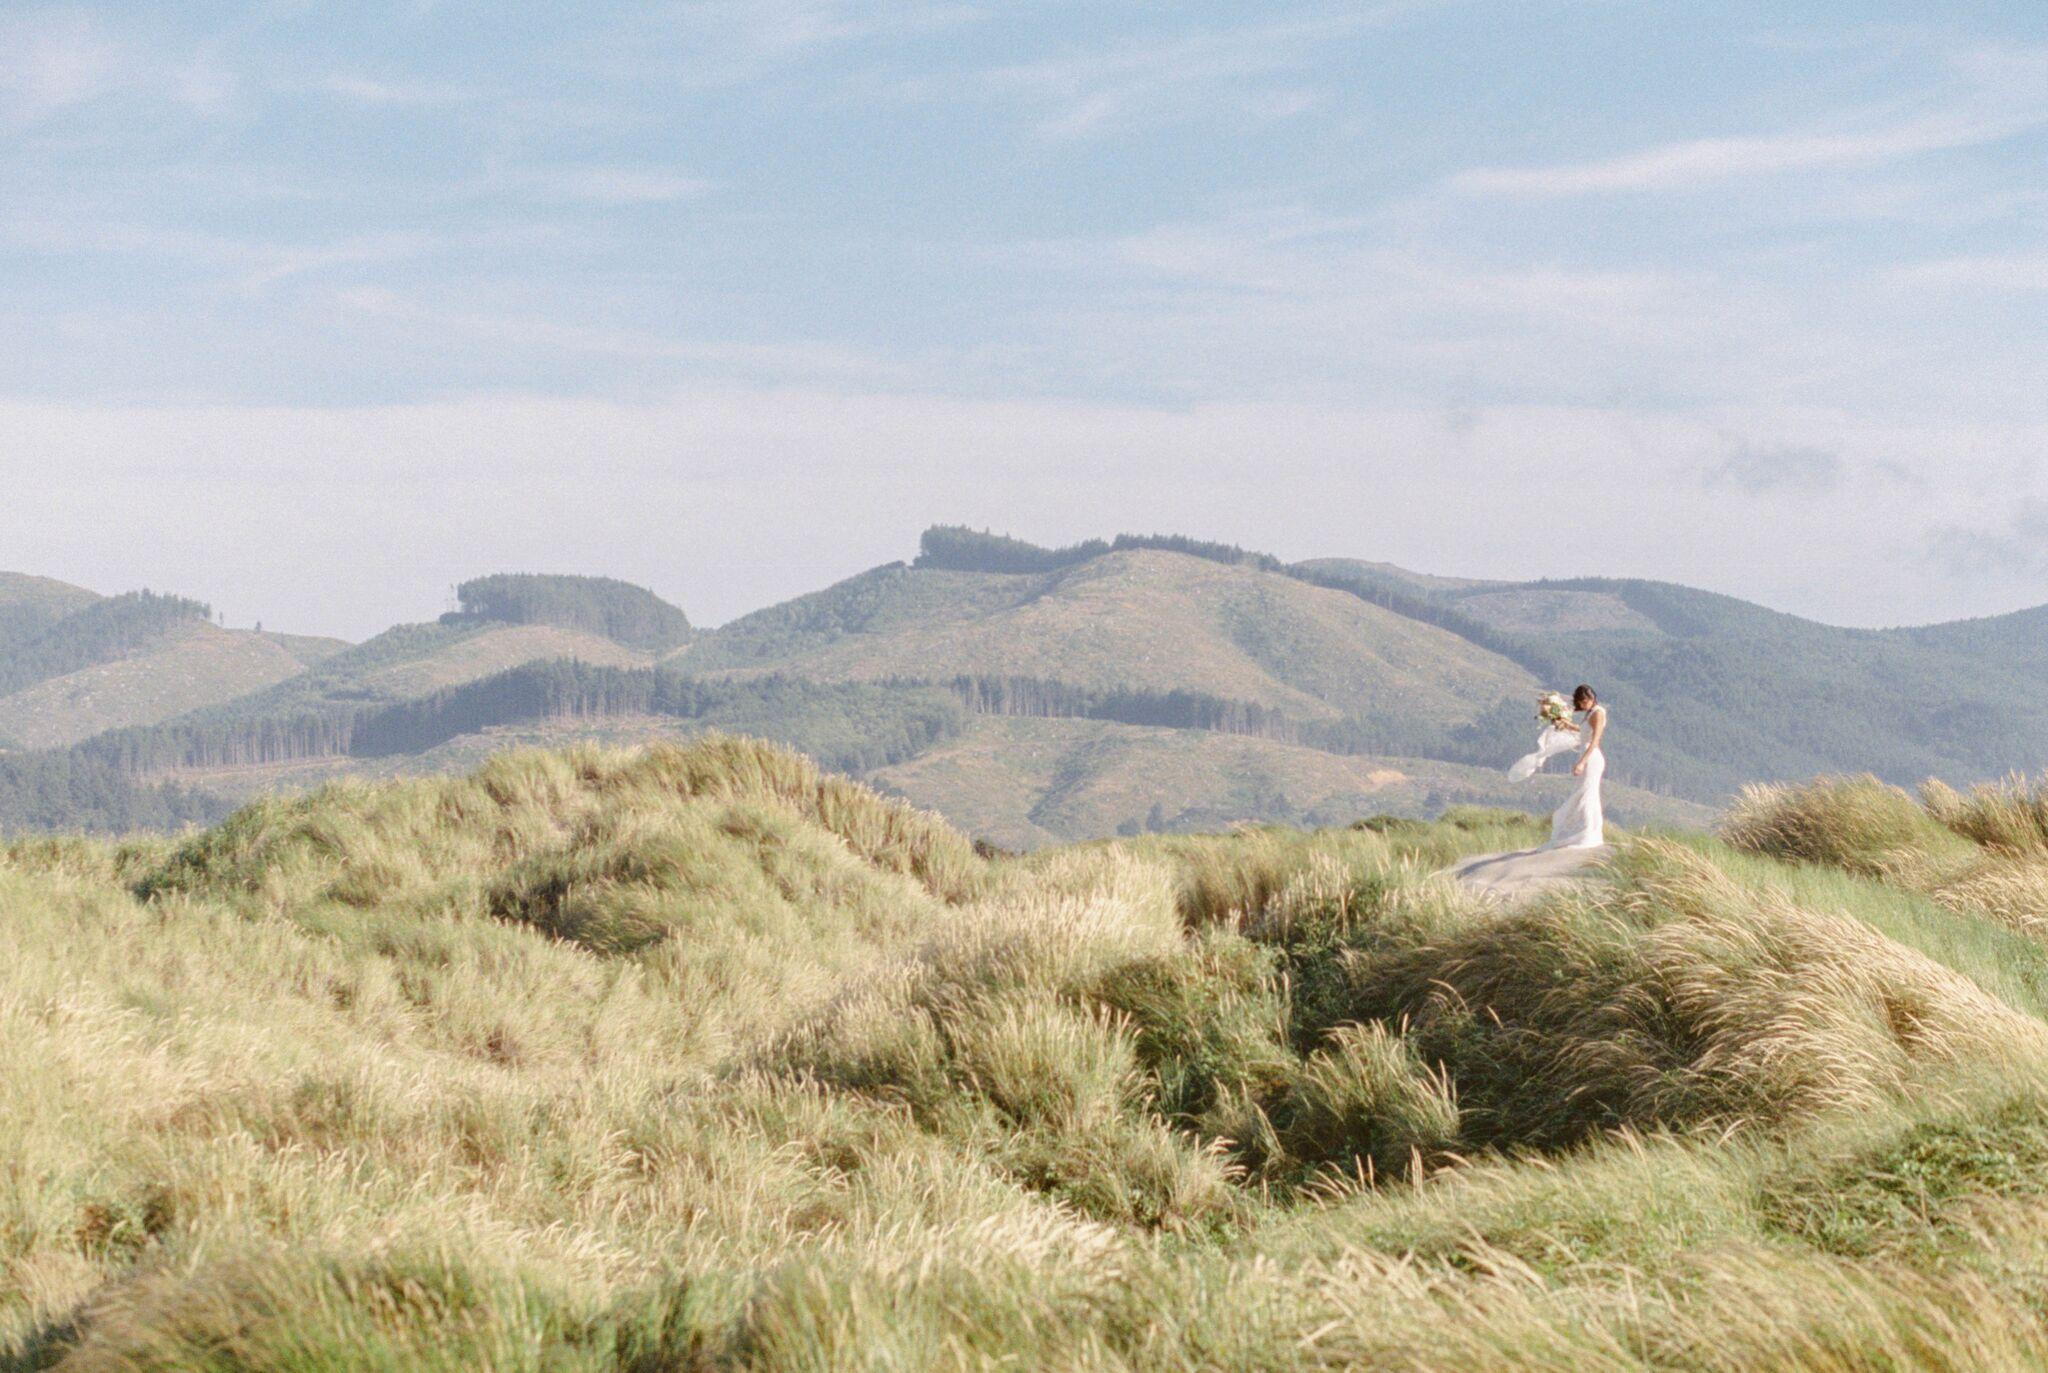 Hochzeitsguide: Footprints in the Sand